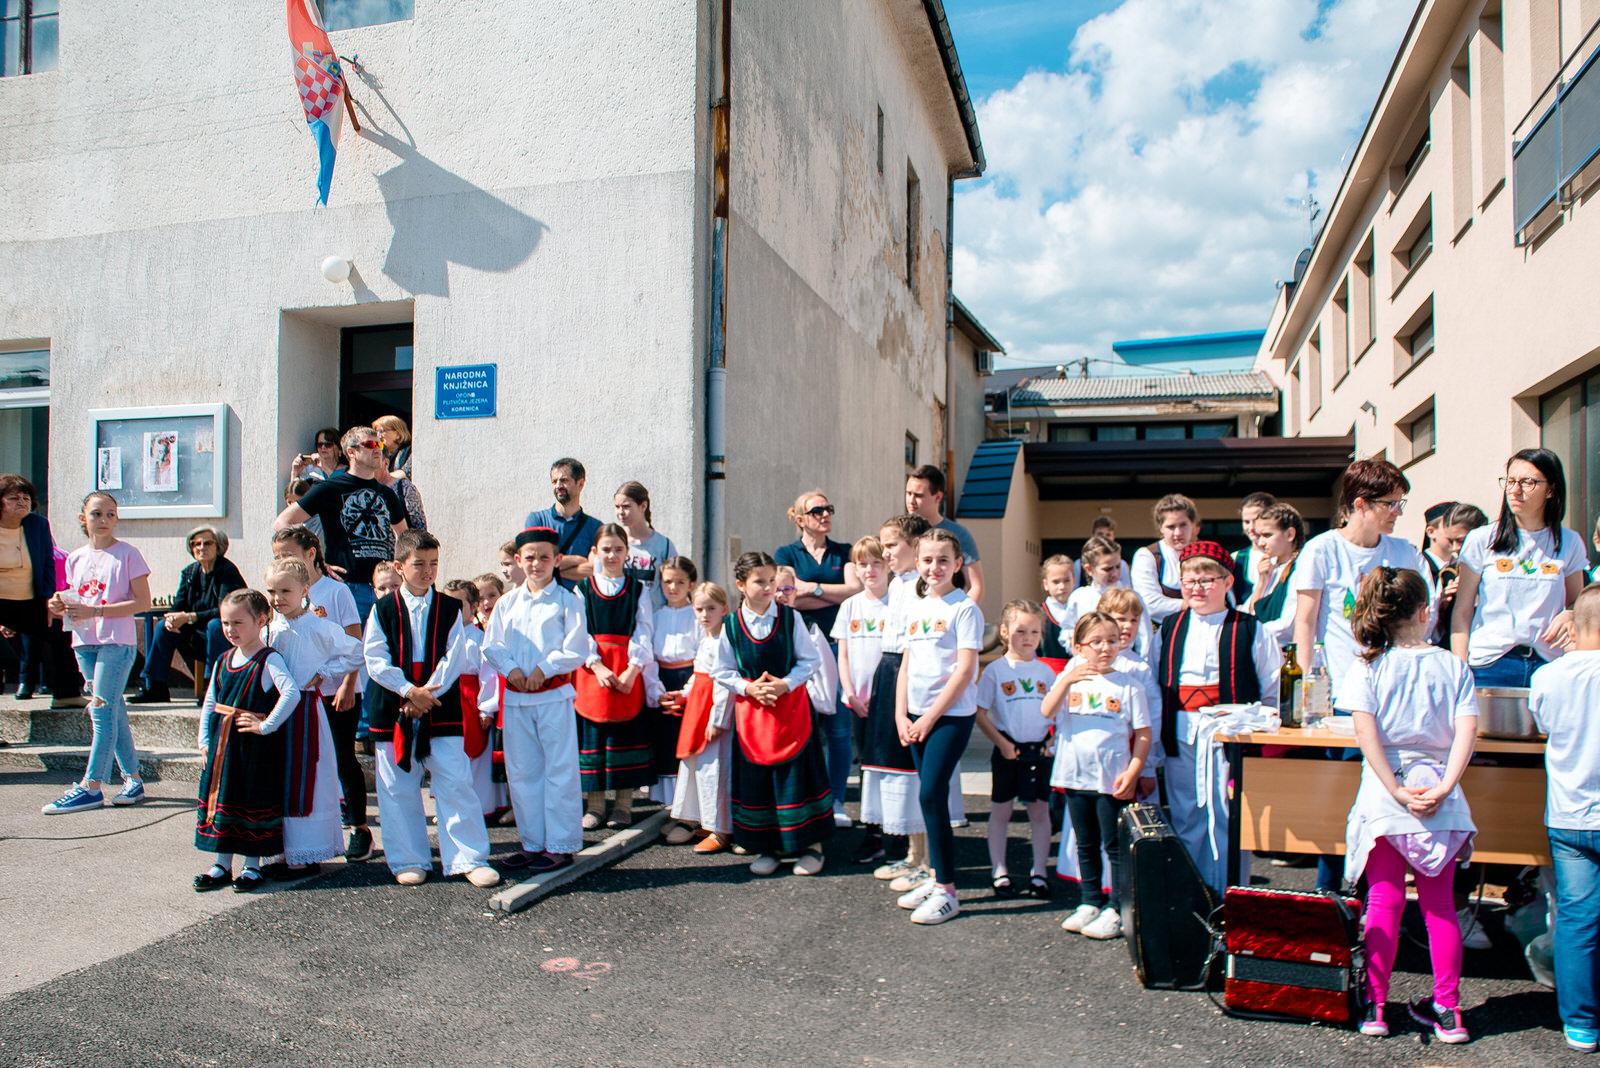 likaclub_korenica_dan-medvjeđeg-luka_2019-16-1